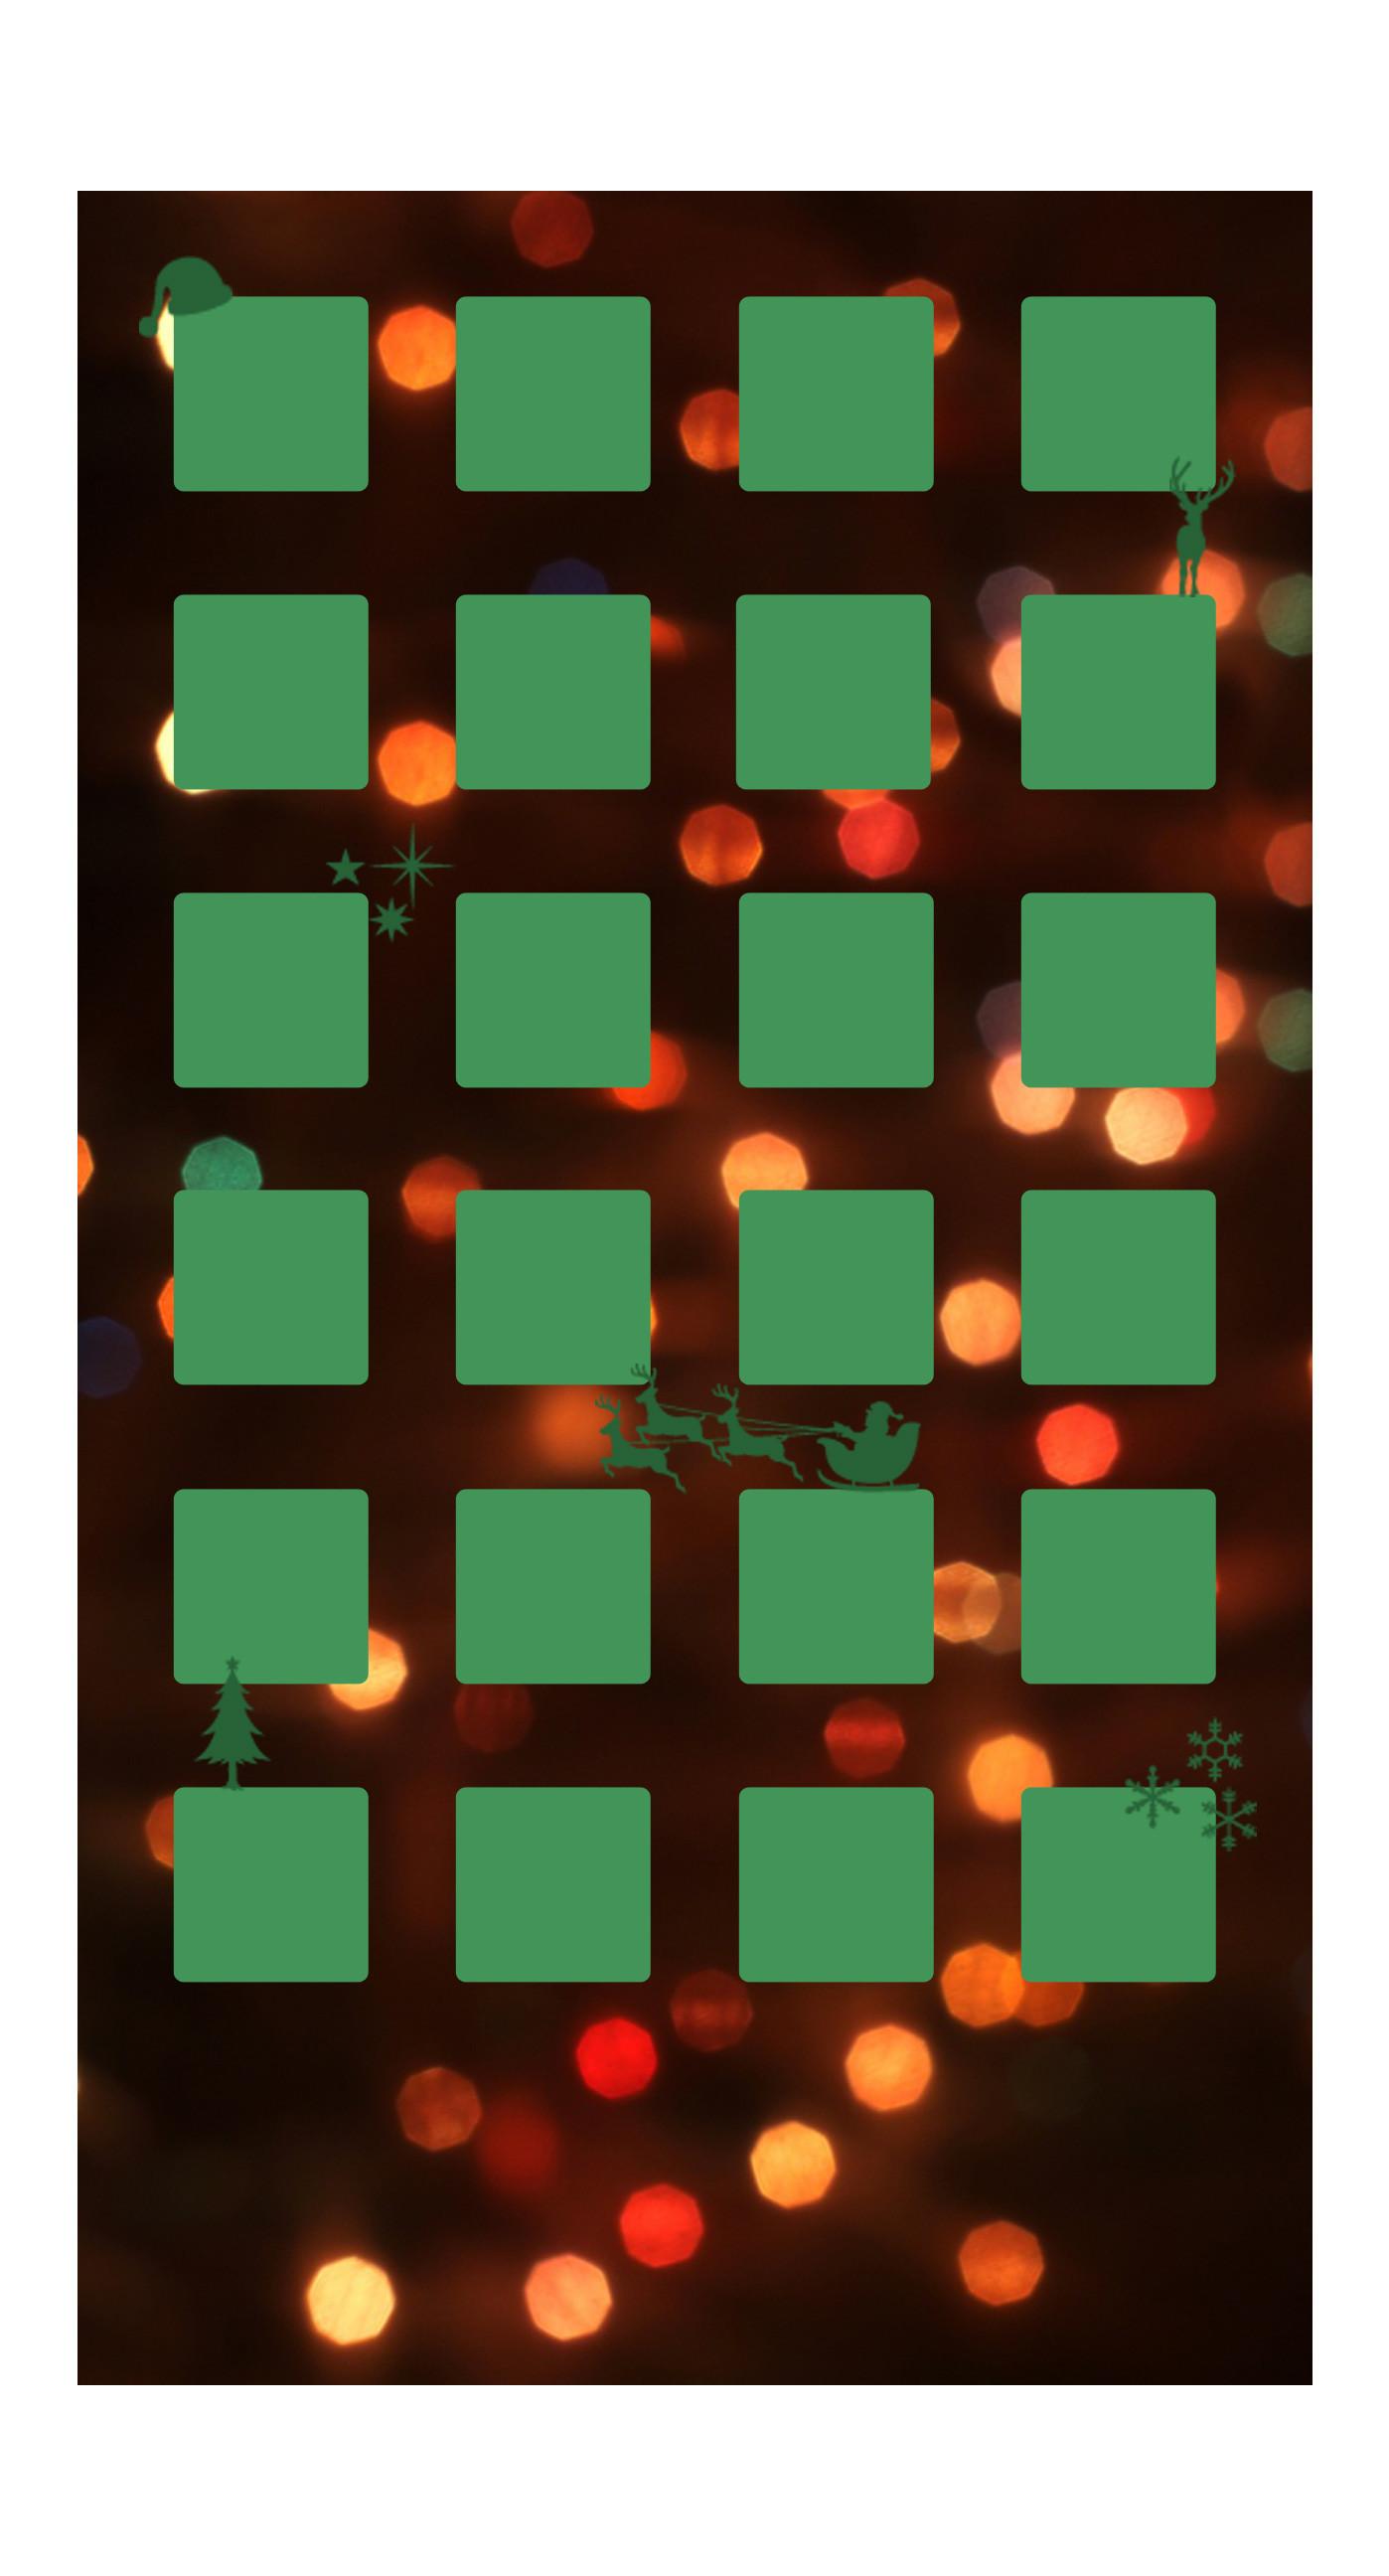 Shelf Christmas green light women iPhone6s Plus / iPhone6 Plus Wallpaper